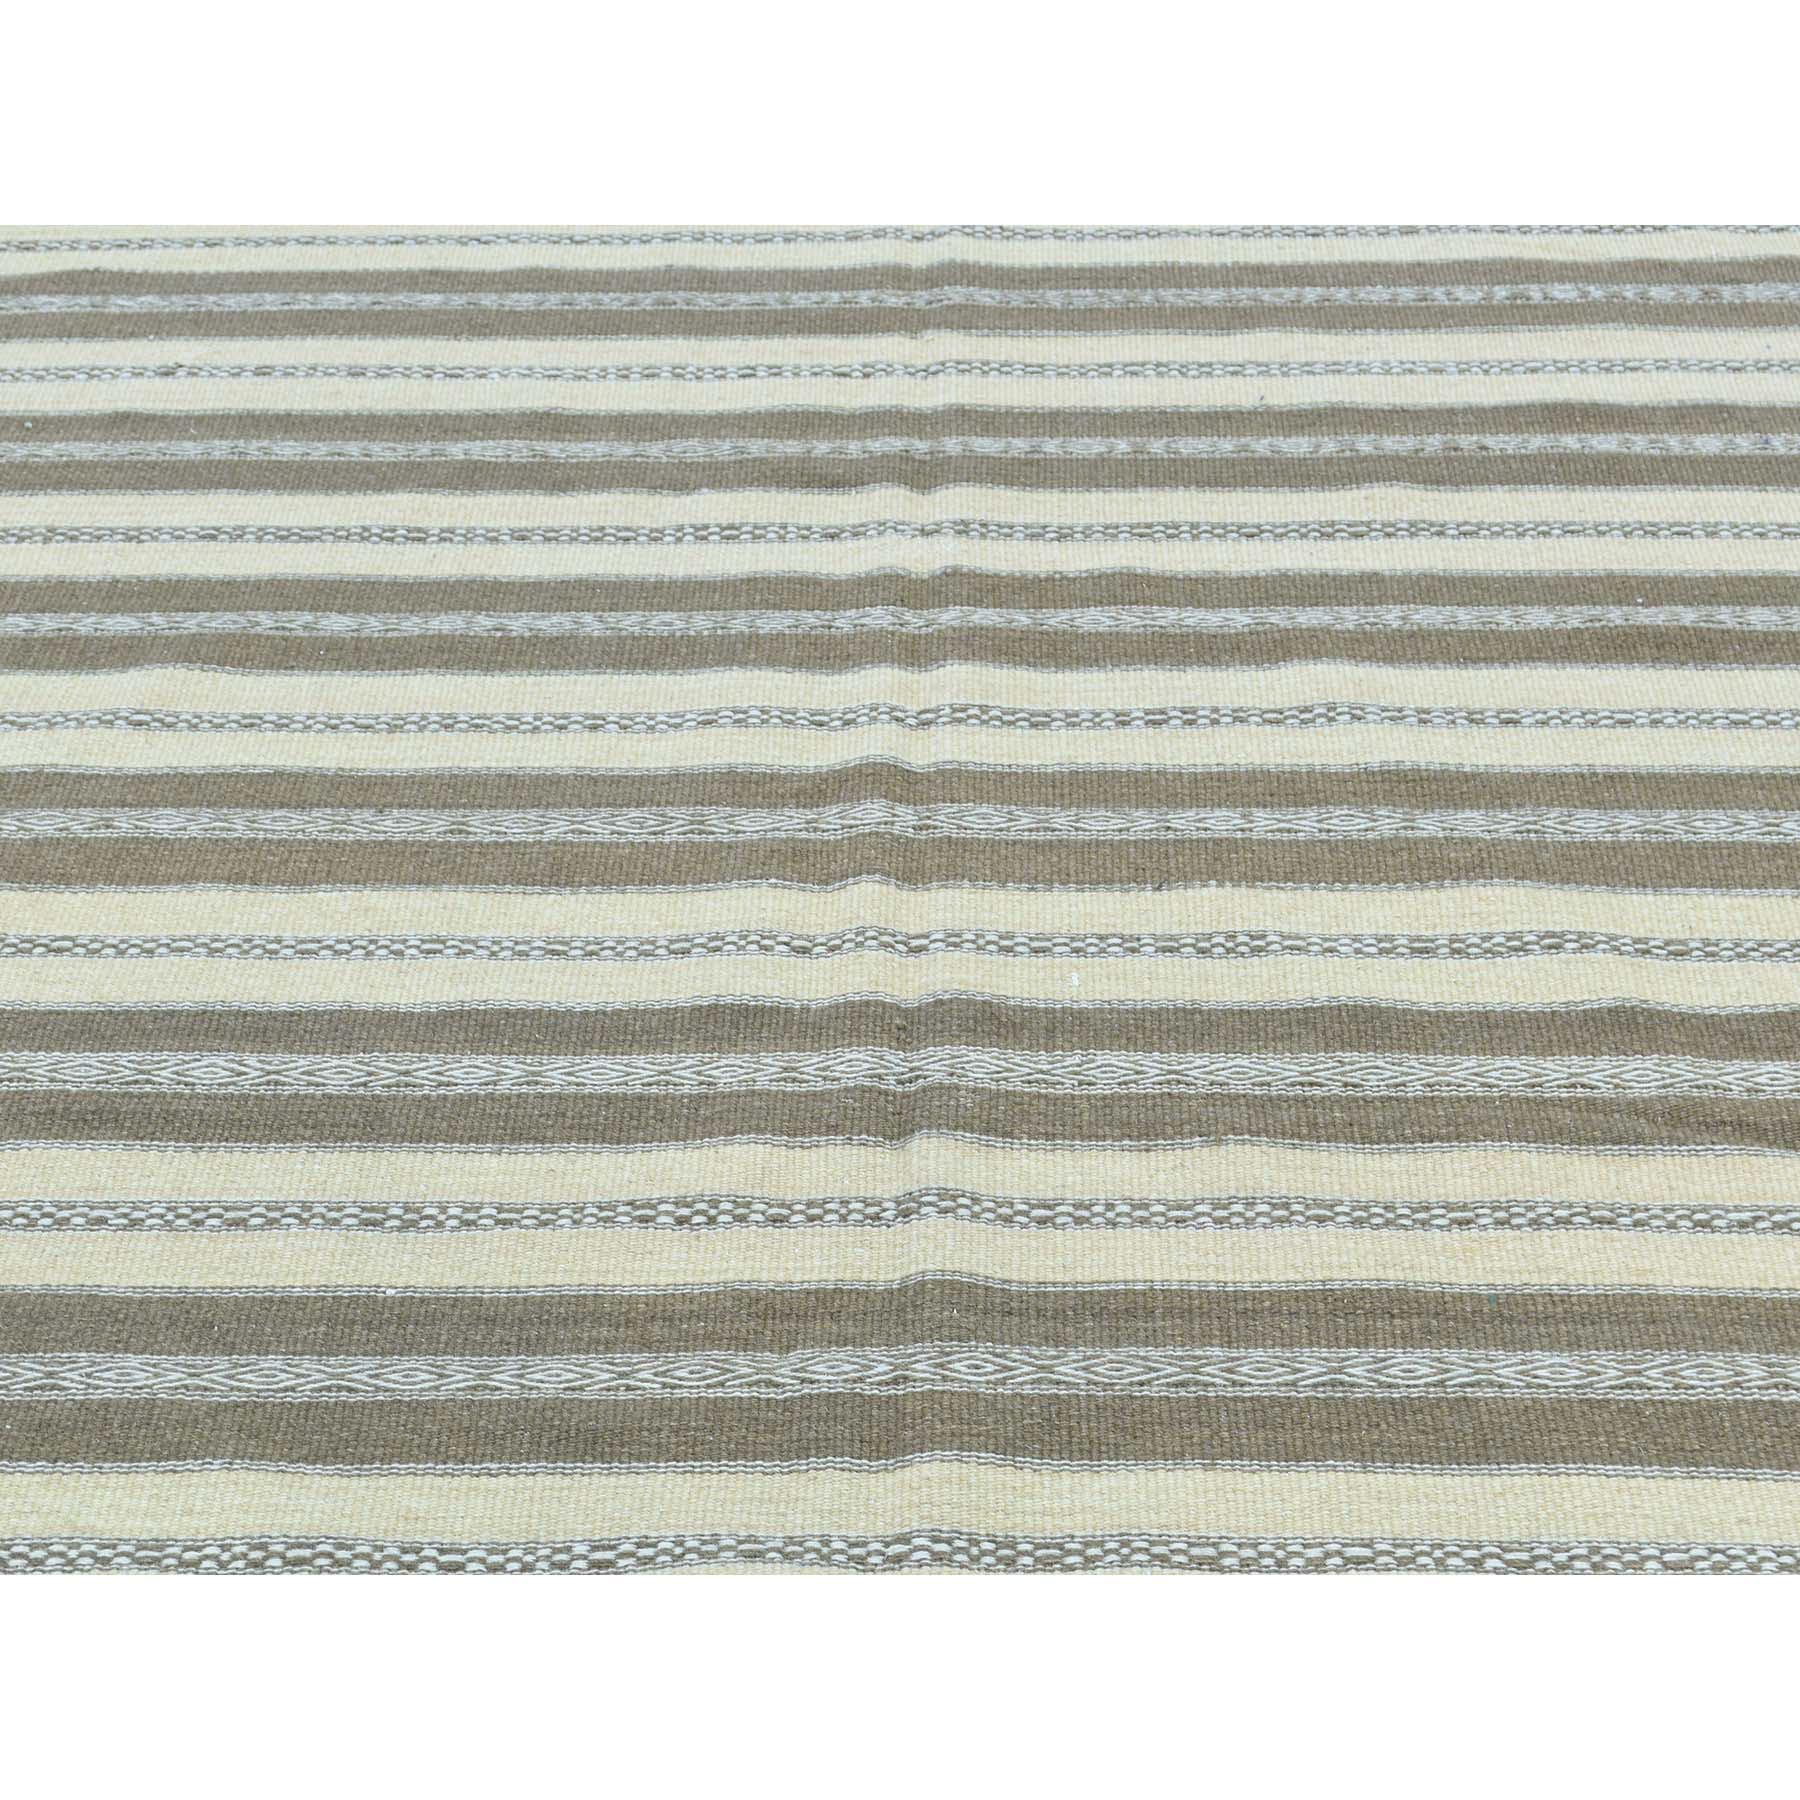 5-x8-1  Hand-Woven Striped Flat Weave Kilim Pure Wool Oriental Rug